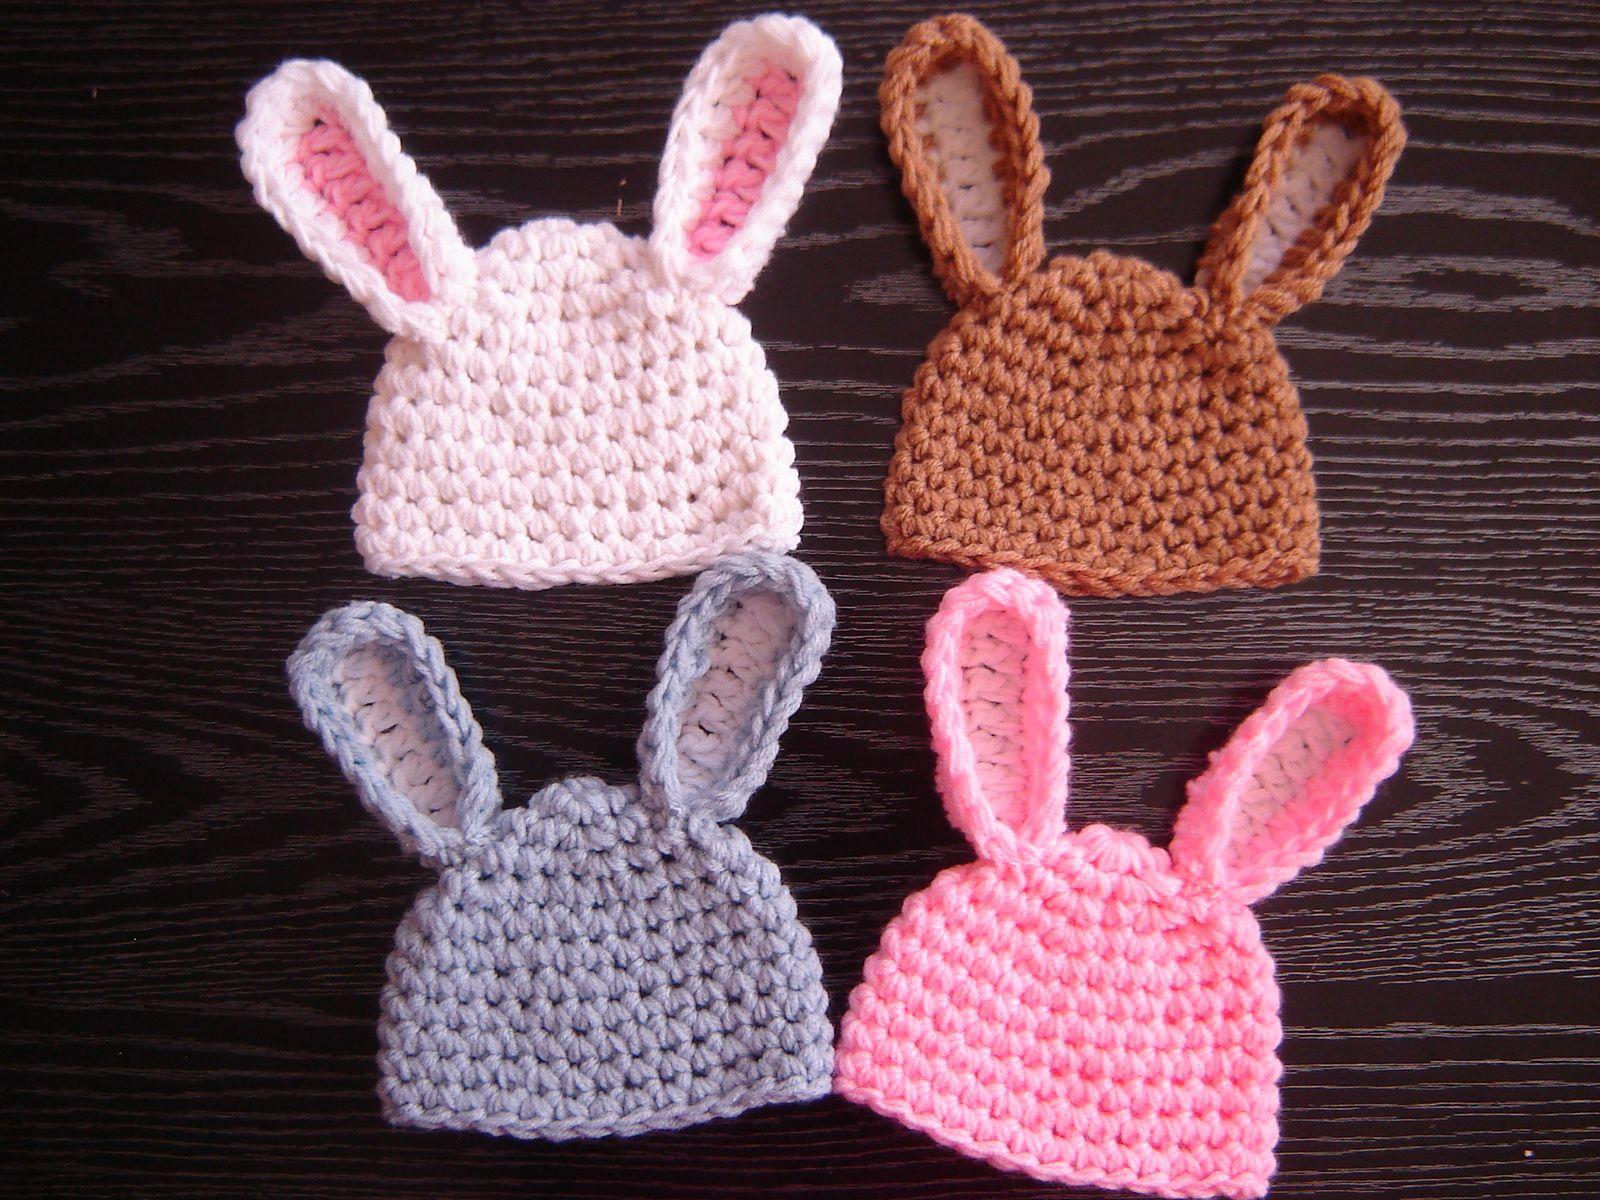 Easy Bunny Hat By JTcreations - Free Crochet Pattern - (ravelry ...